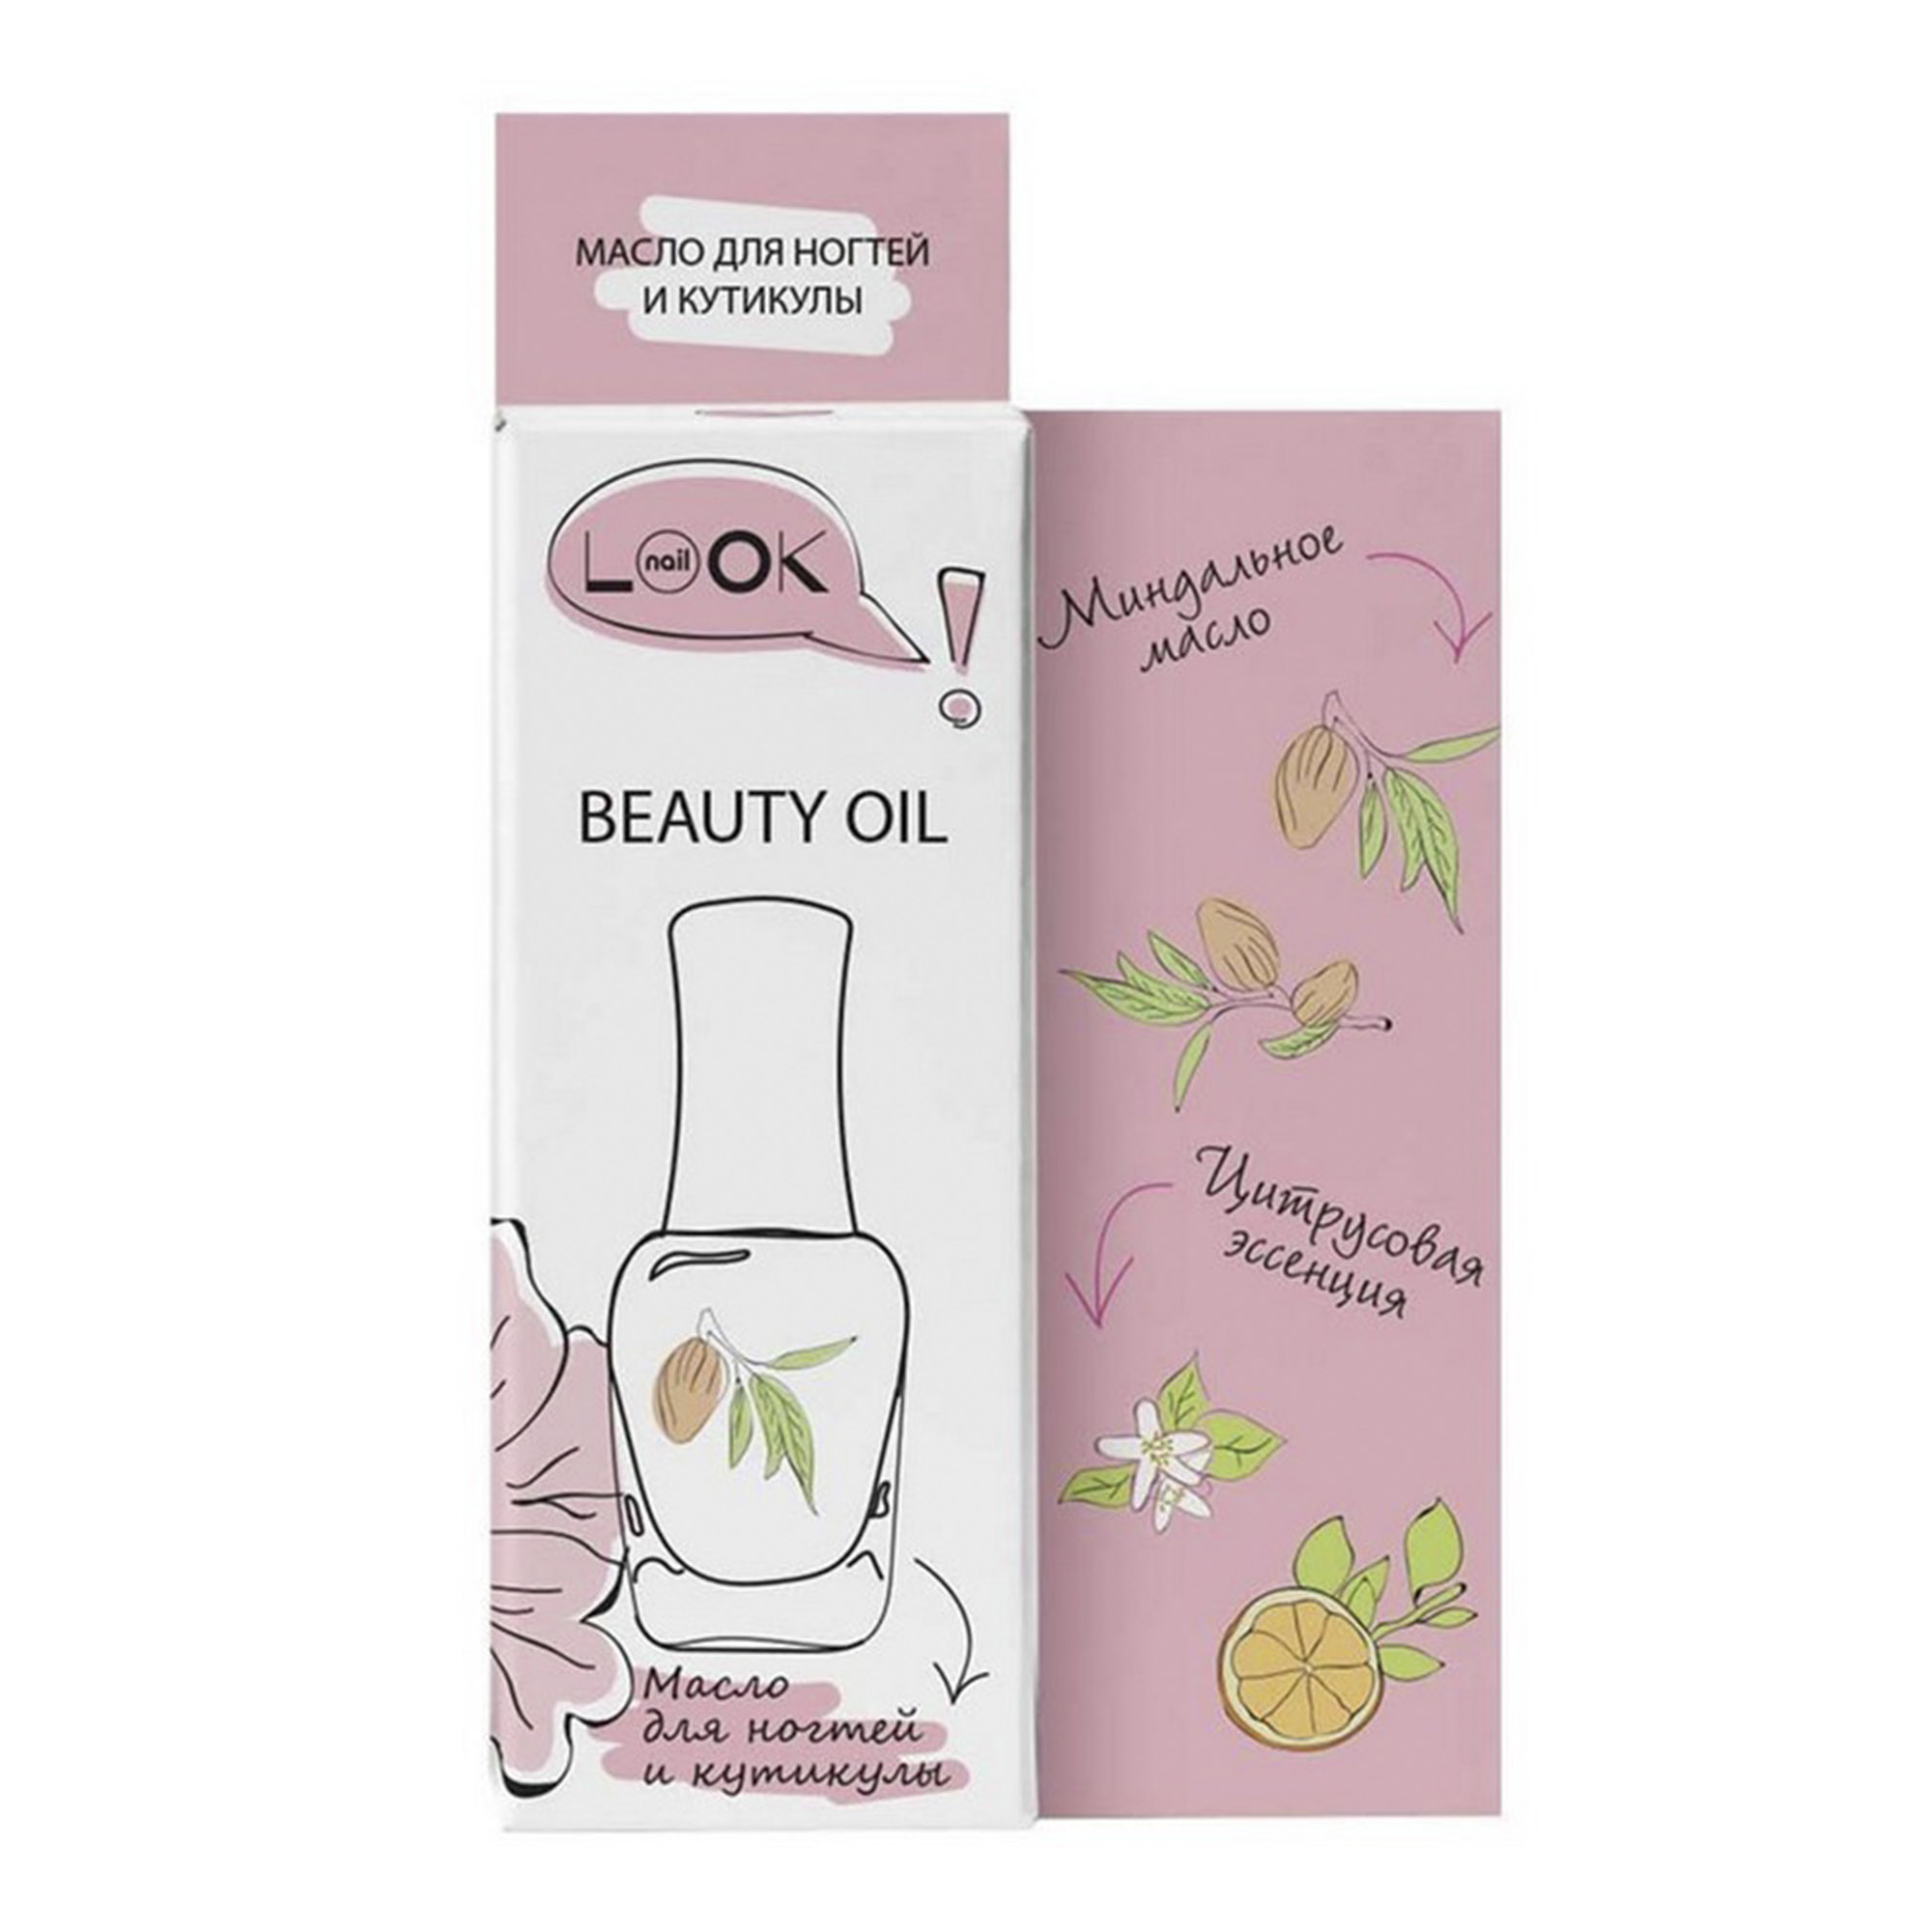 Масло NailLOOK Beauty для ногтей и кутикулы 13 мл масло naillook beauty для ногтей и кутикулы 13 мл